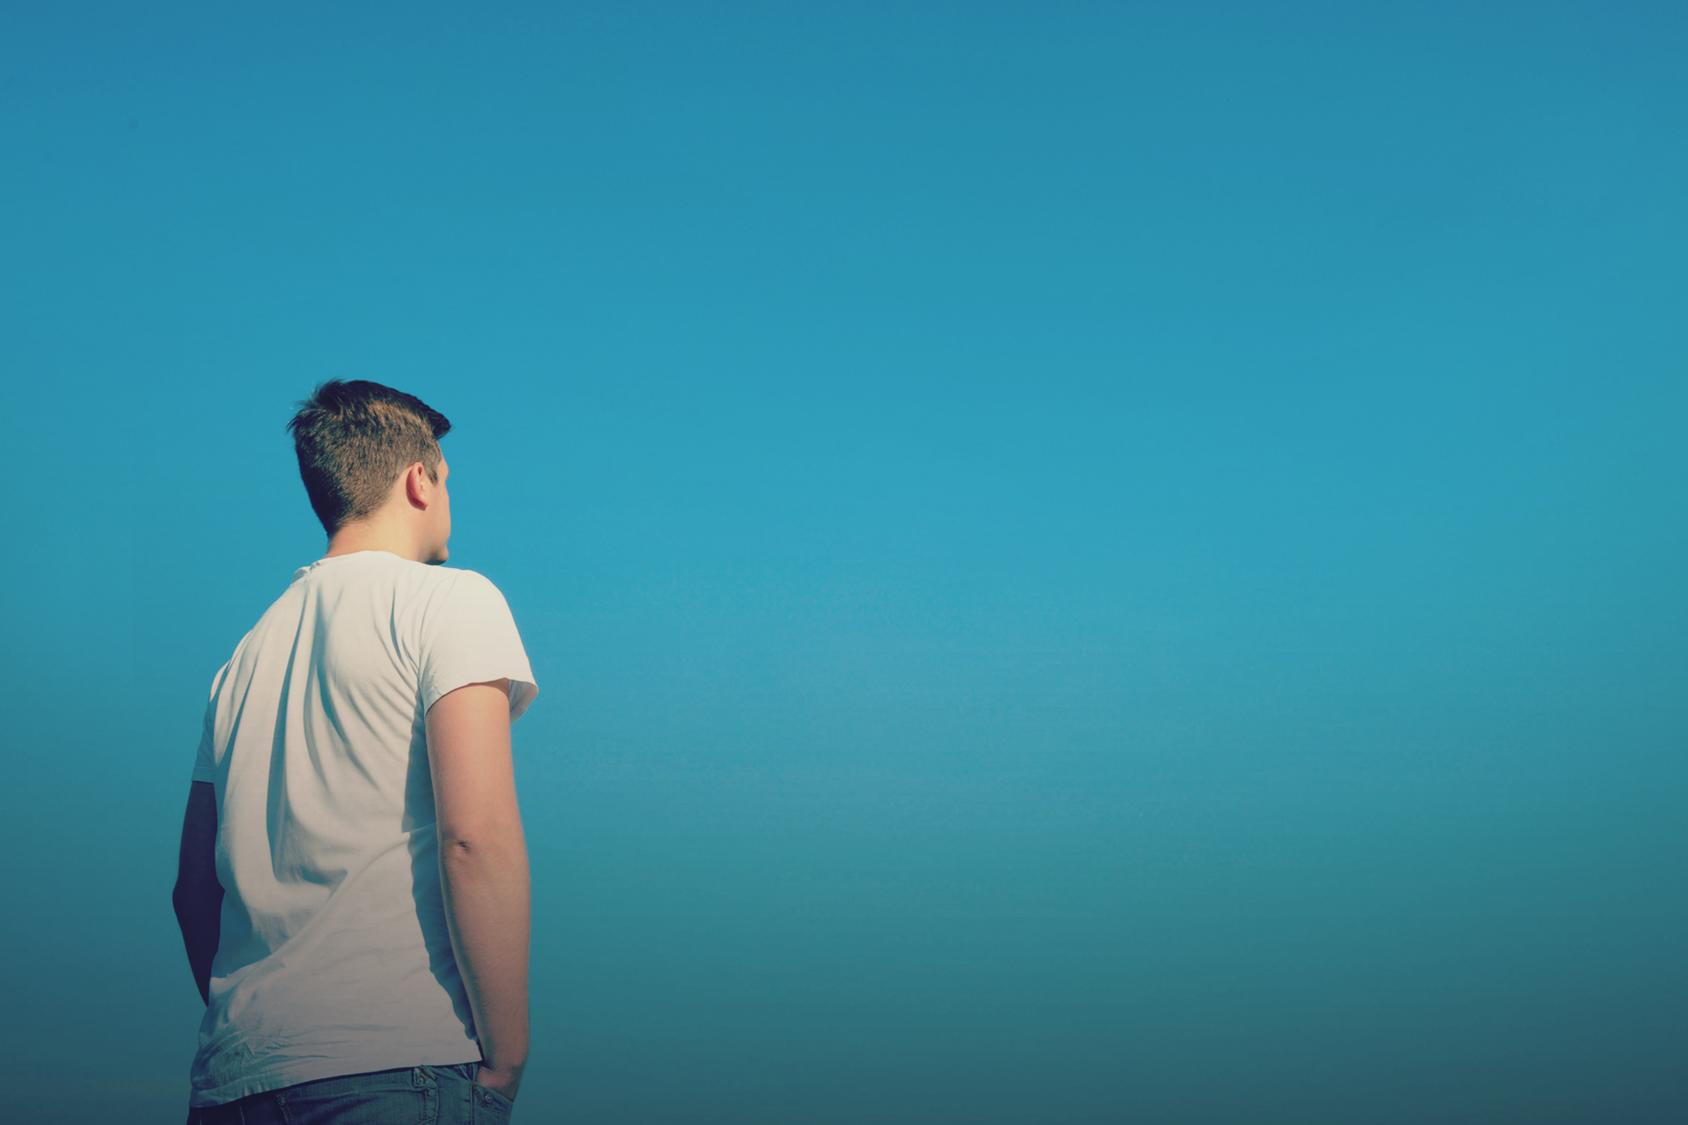 ¿Qué tipo de hombres no deberían aplicar para entrar al ministerio? Parte #1 por Robert Canfield